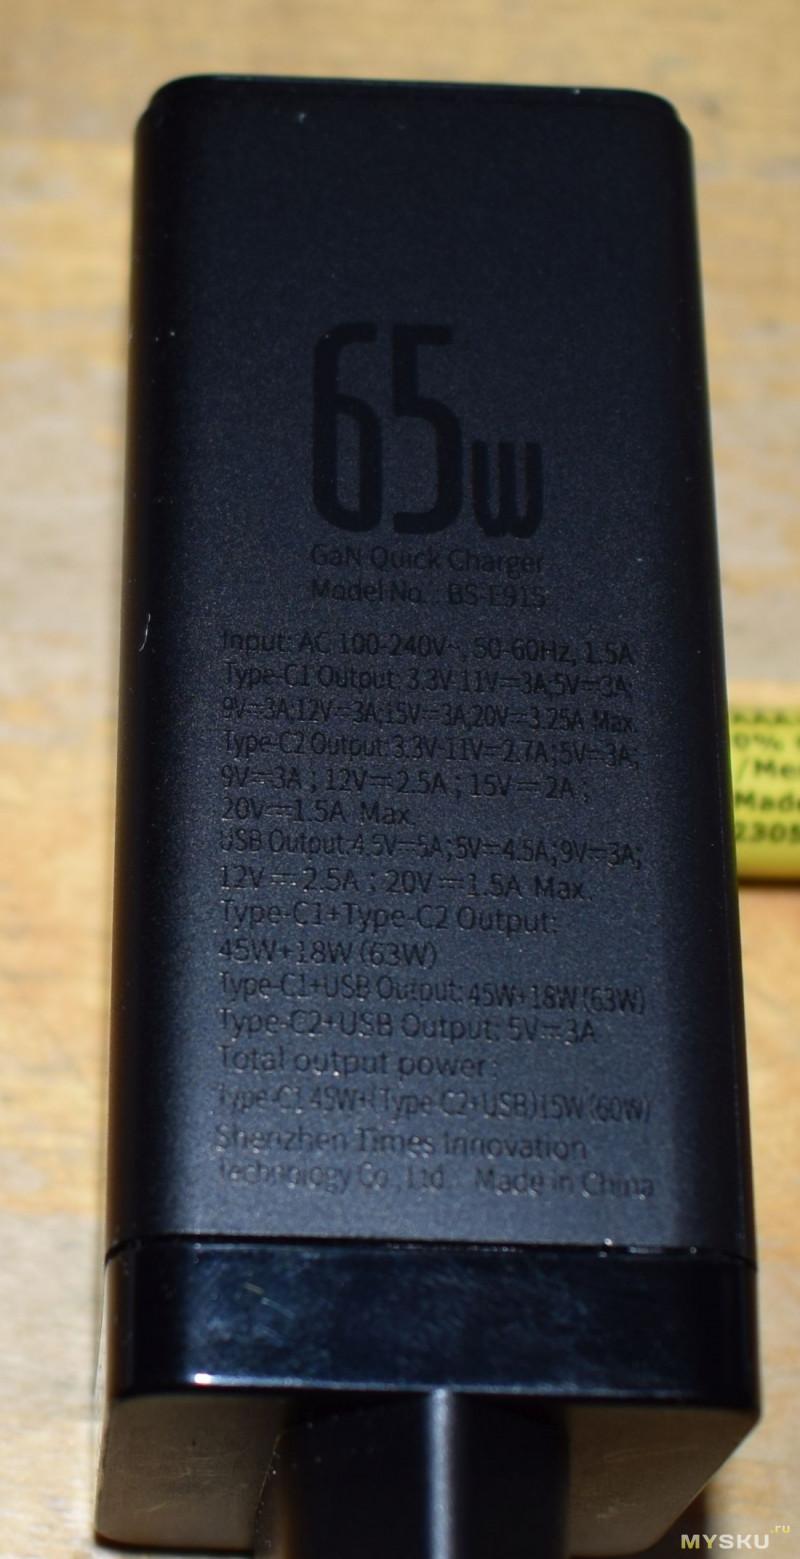 Baseus BS-E915 65W GaN - разбираем, разбираемся